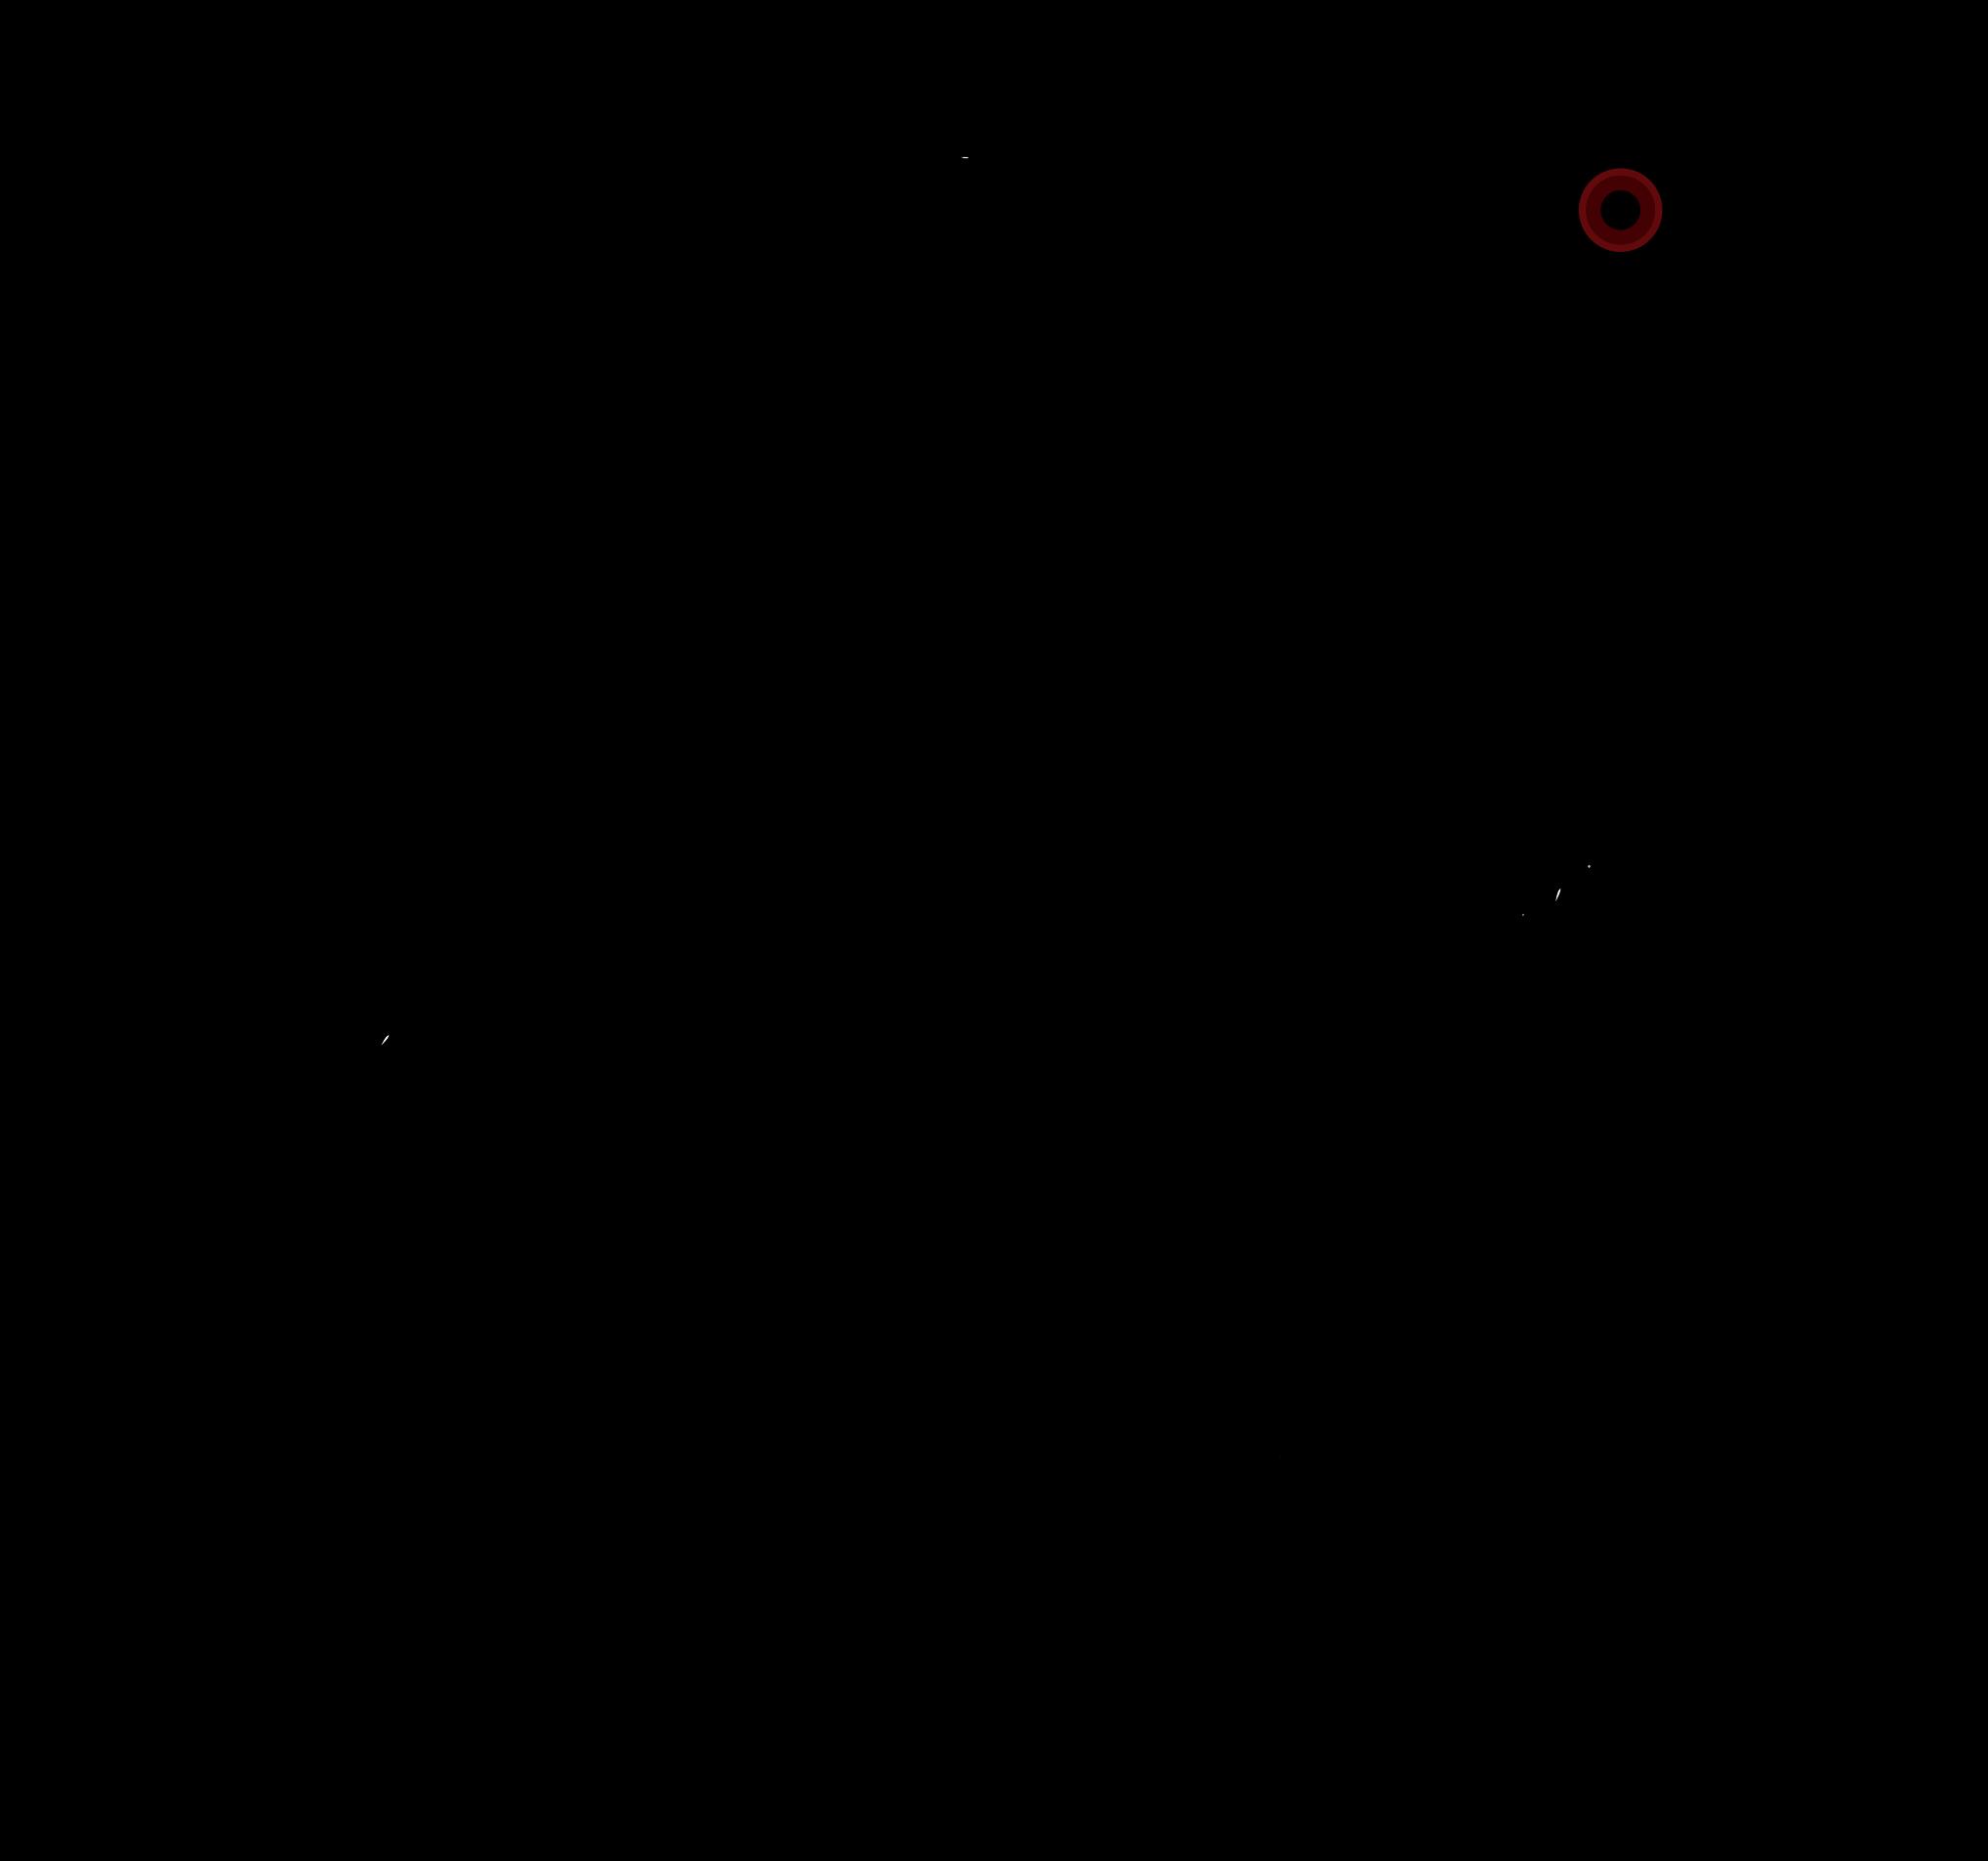 2036x1906 Clipart